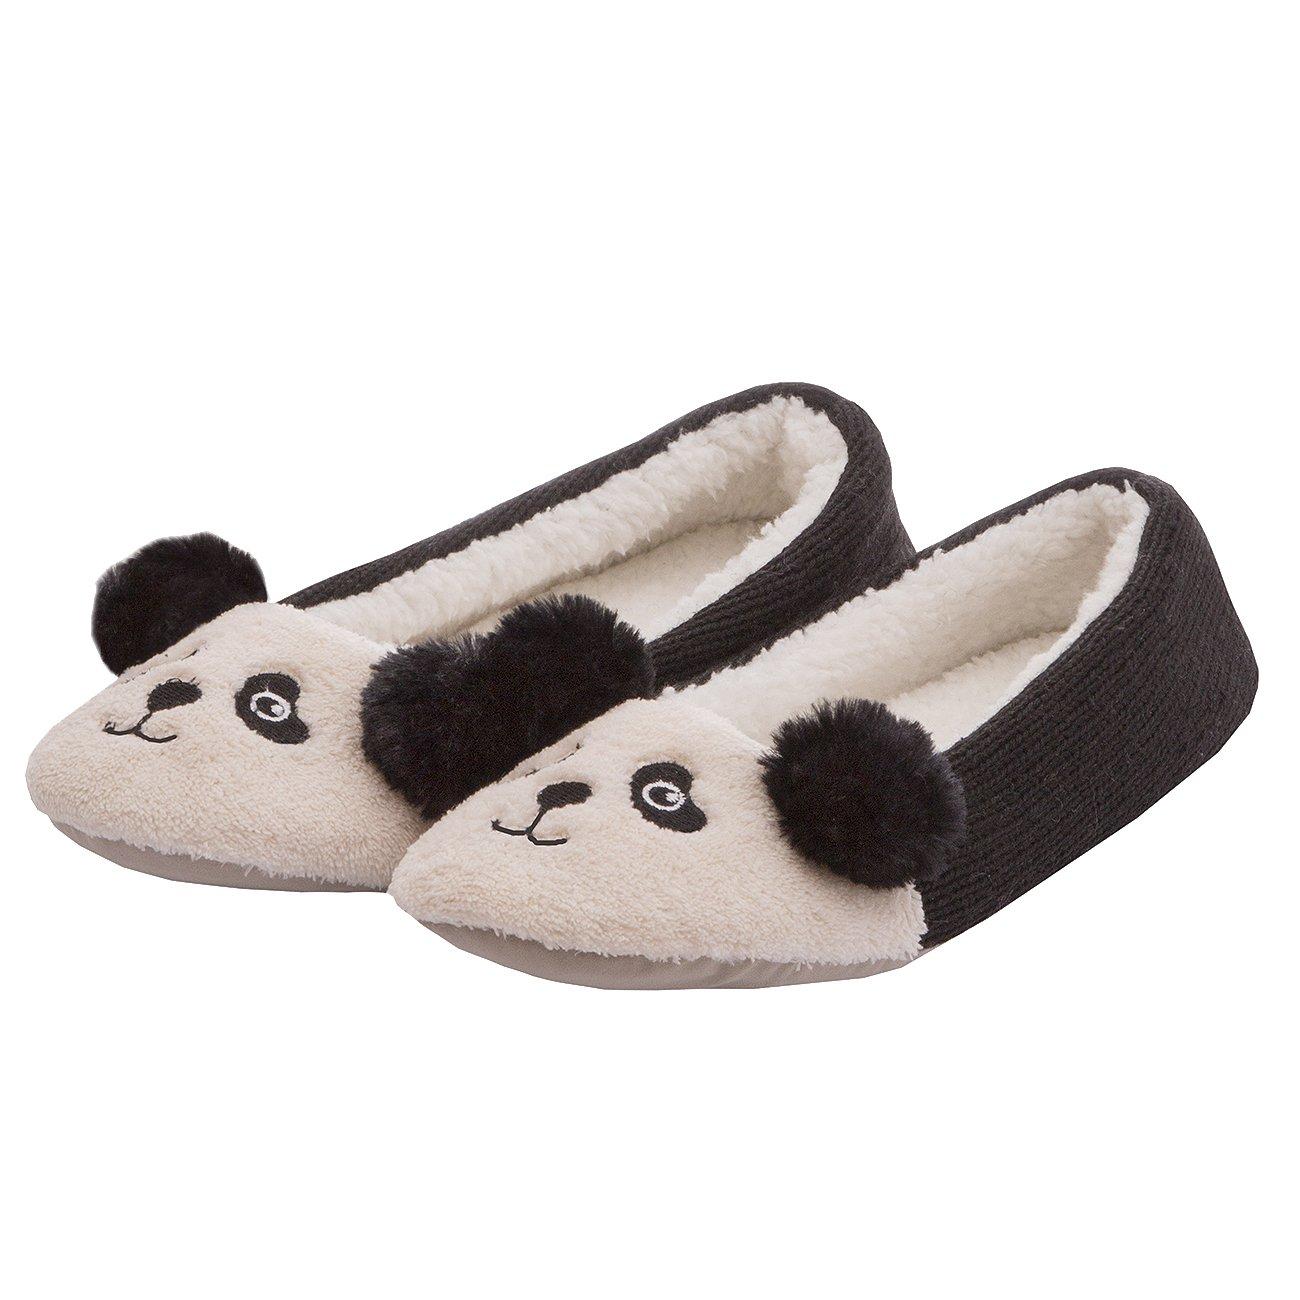 e6daf131de23 Forever Dreaming Ladies Womens Novelty Faux Fur Animal Panda Unicorn Slipper  Indoor Textile Sole  Amazon.co.uk  Shoes   Bags